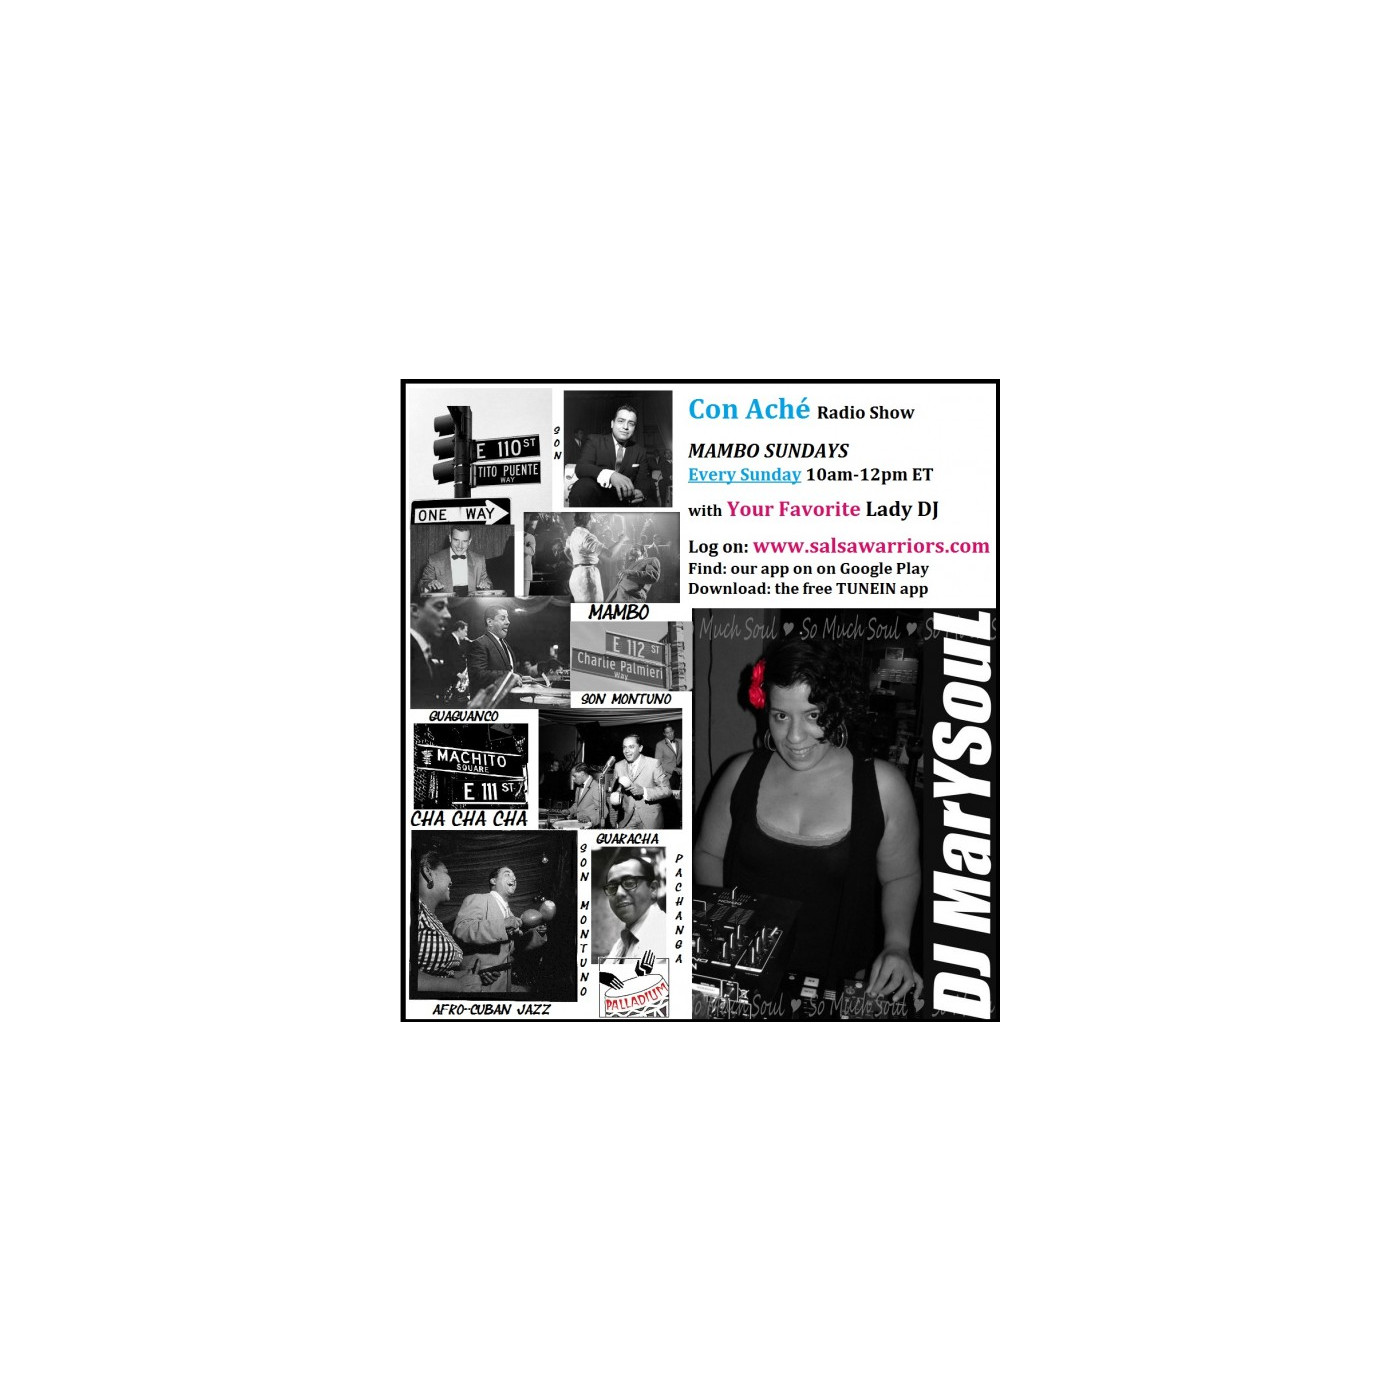 Con Ache Sundays with DJ Mar Y Soul on www.salsawarriors.com -  November 9, 2014